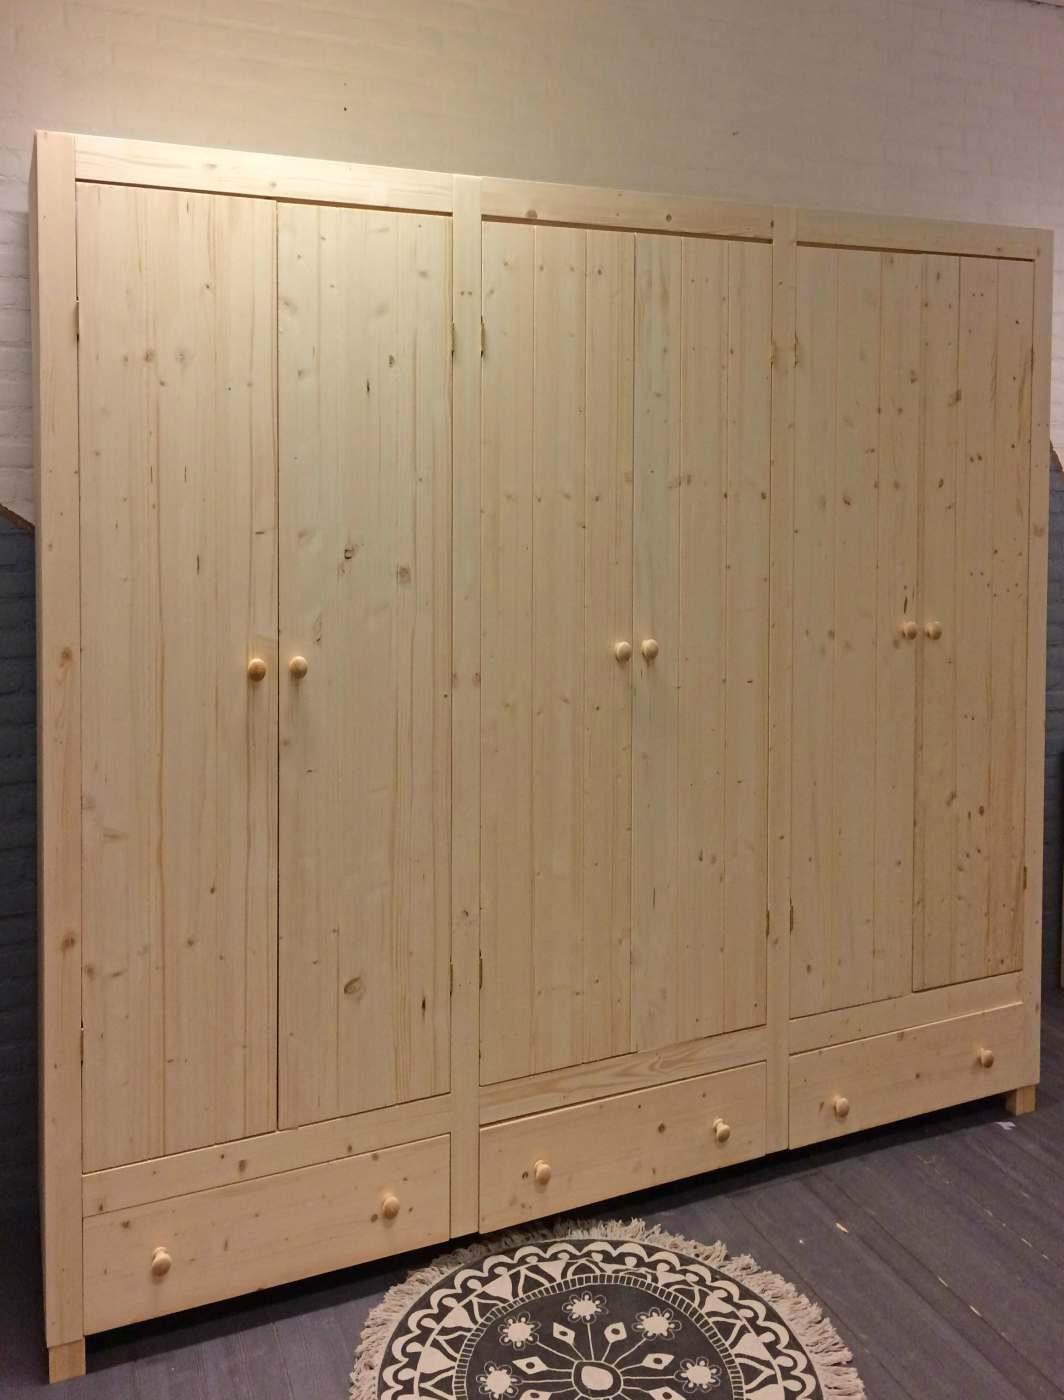 6 deurs Ameland + laden